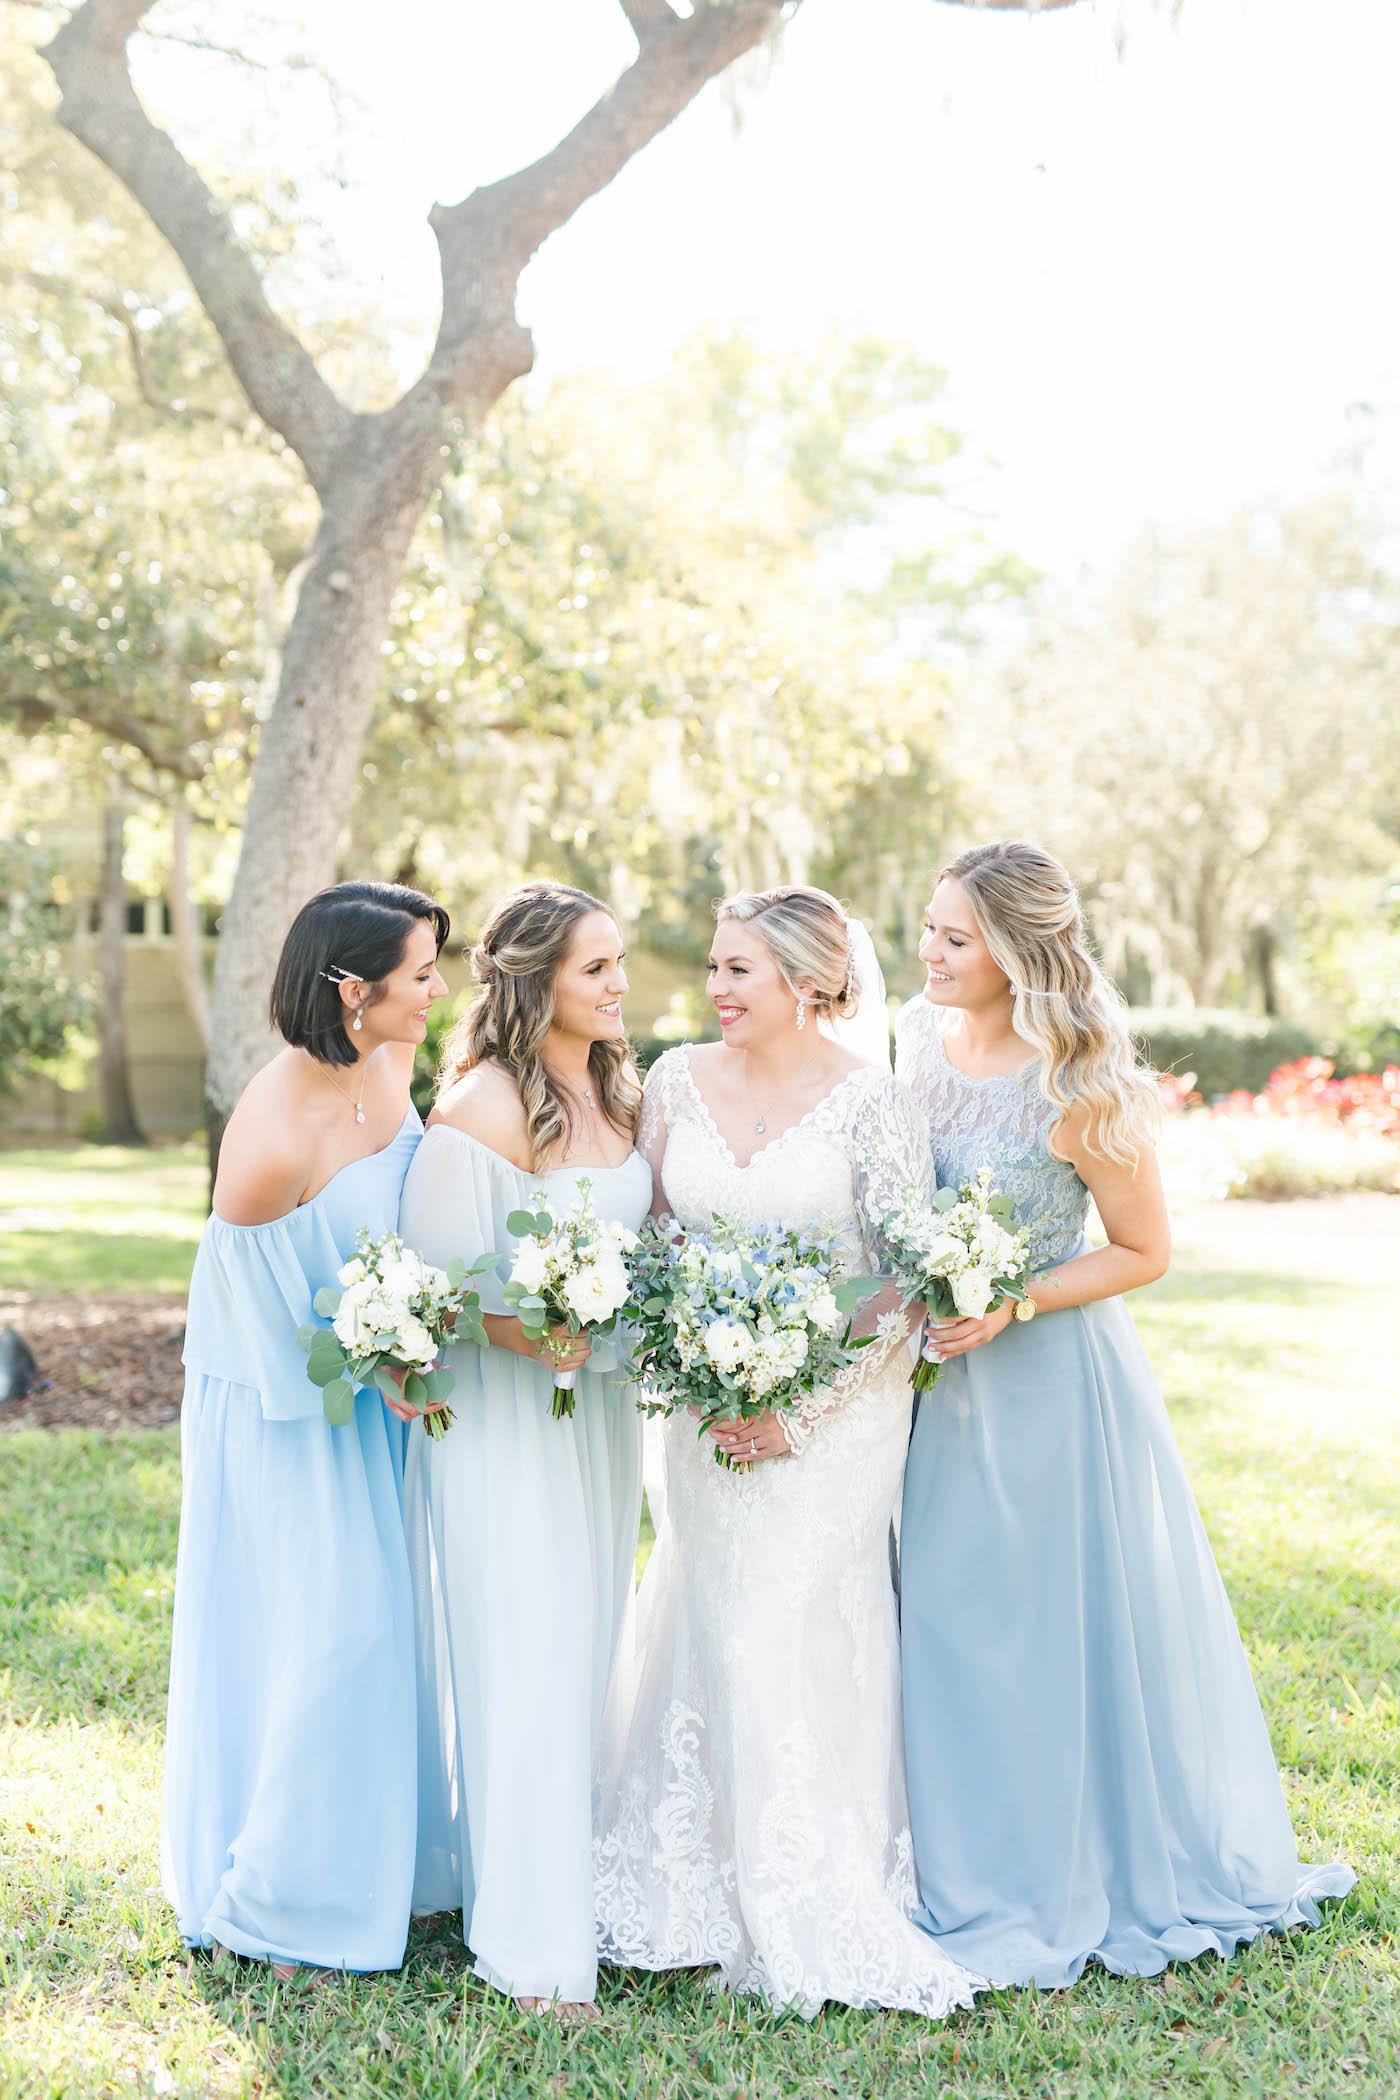 Bride and Bridesmaids Outdoor Garden Portrait   Bridesmaids in Mismatched Light Blue Long Chiffon Dresses   Blue and White Wedding Bouquets   Femme Akoi Beauty Studio